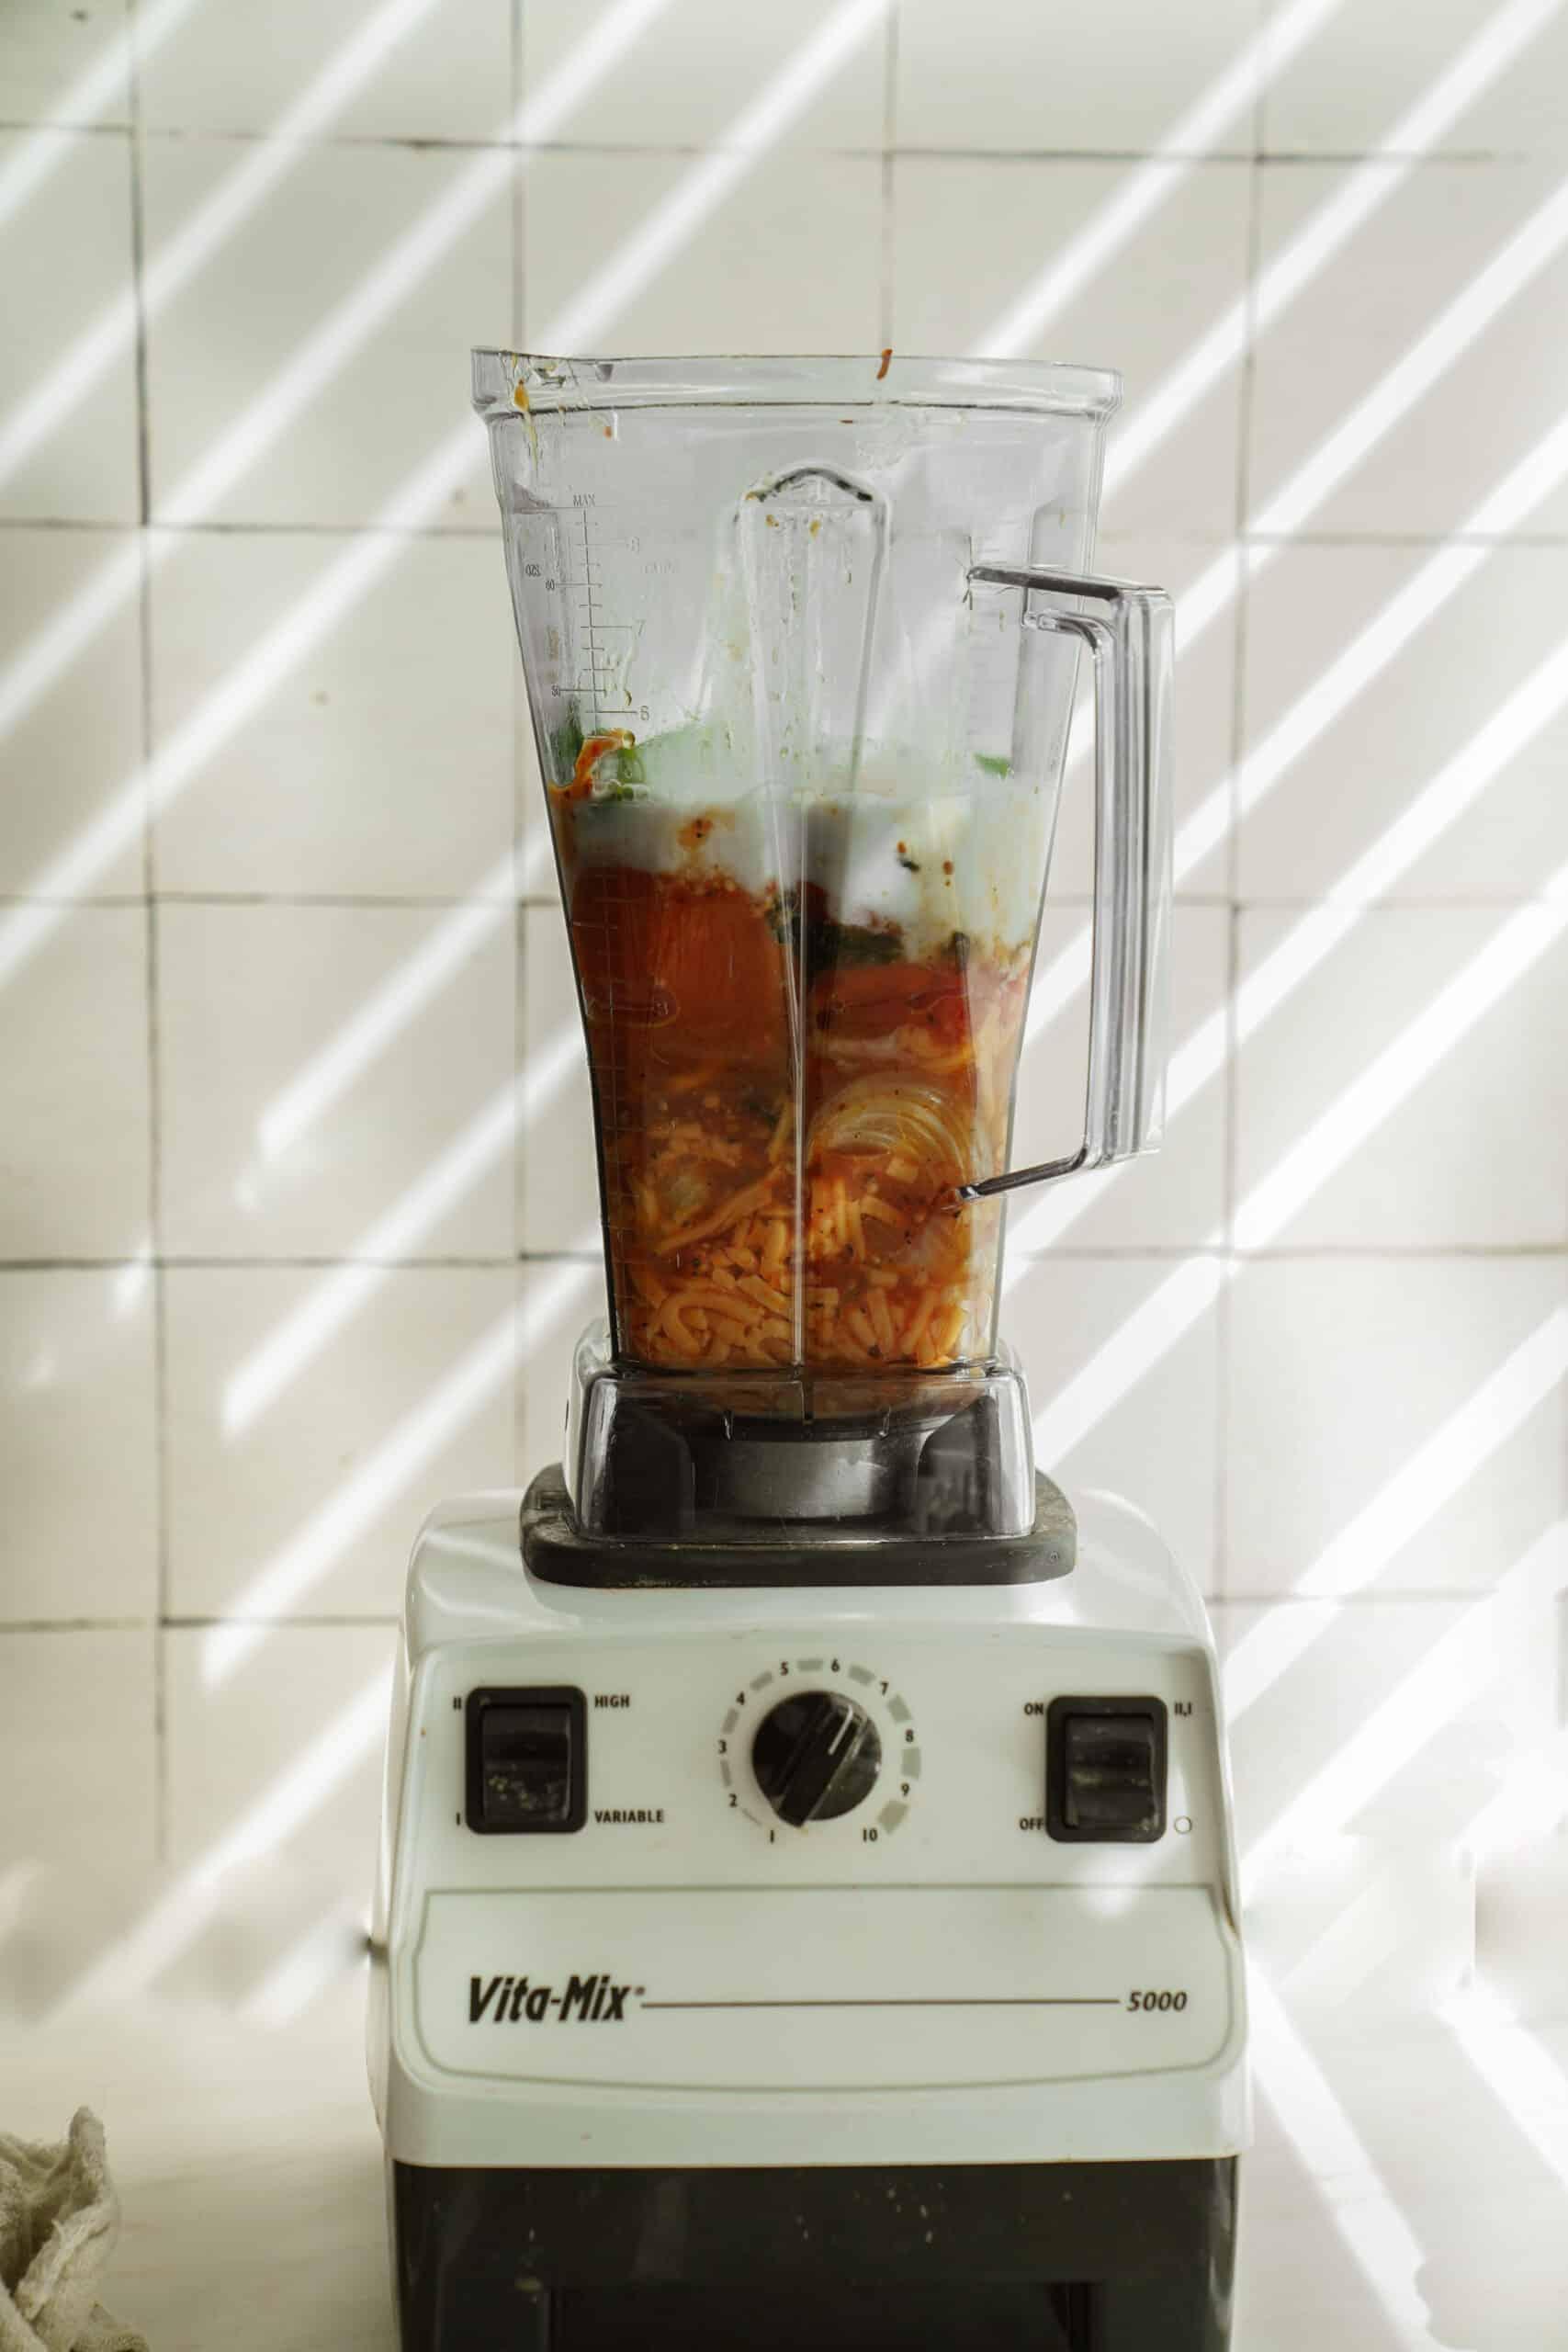 Soup ingredients in a blender